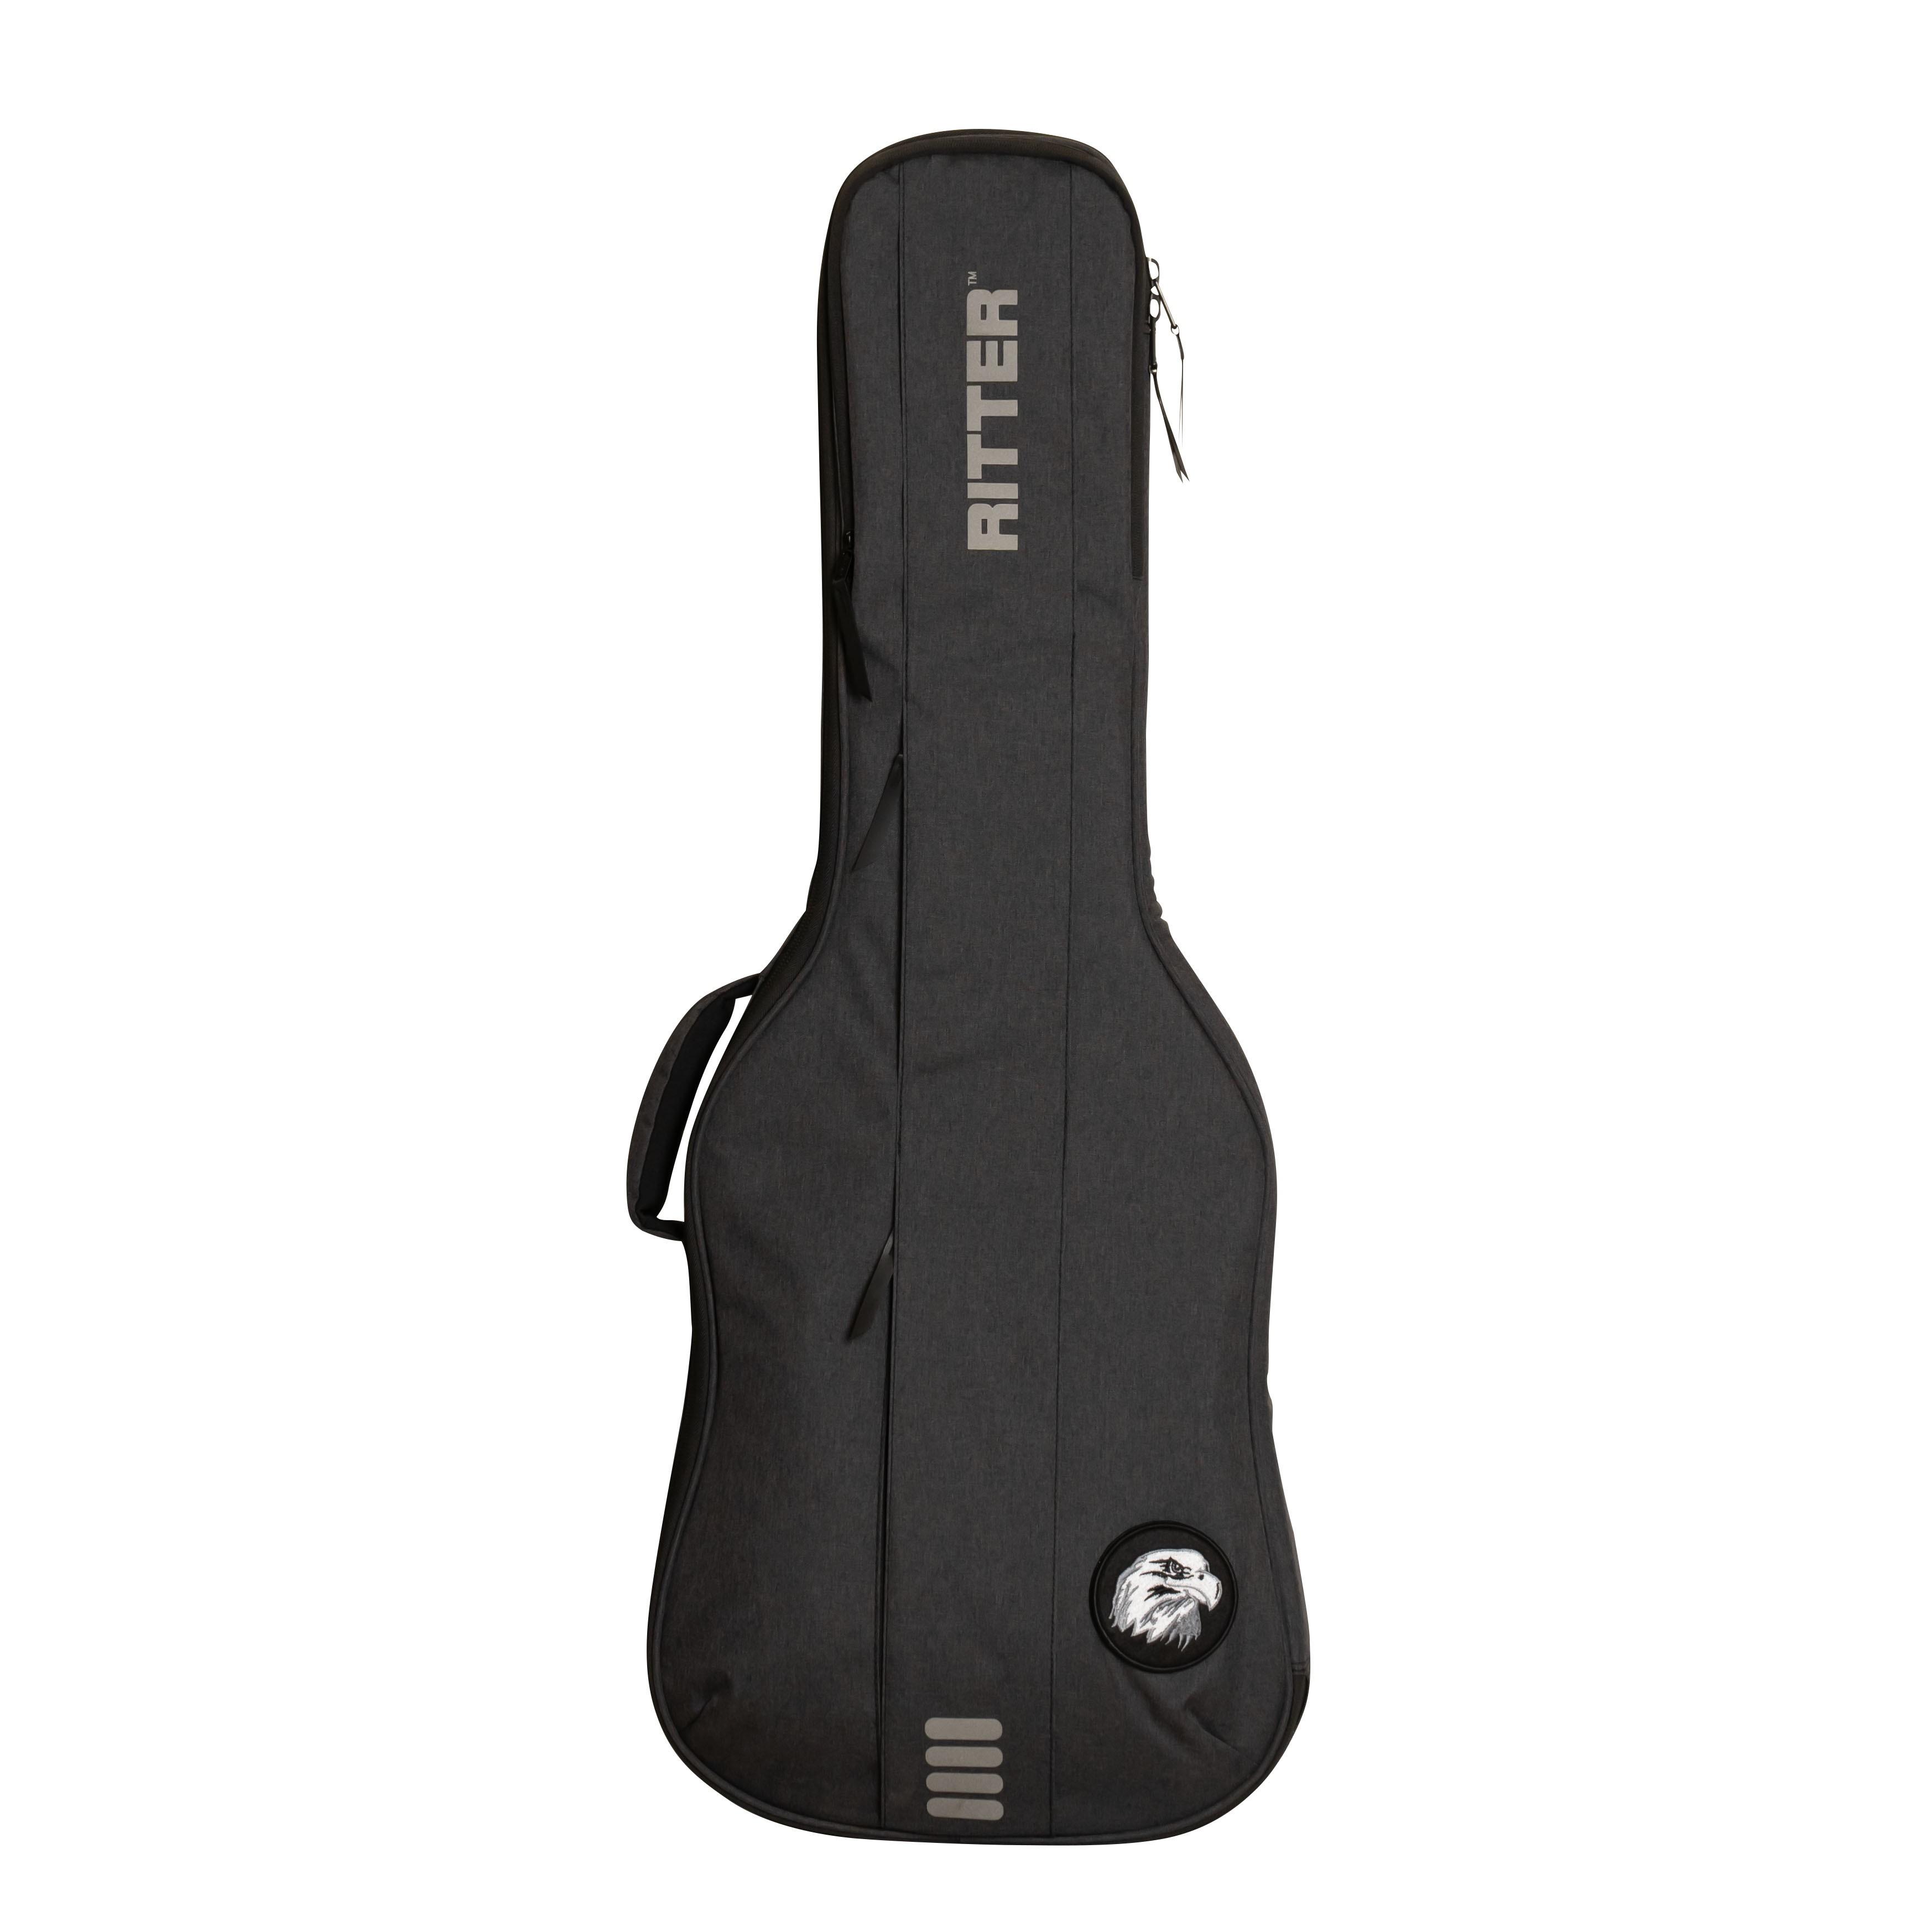 Ritter Bern Electric Guitar Bag - Anthracite (RGB4-E)